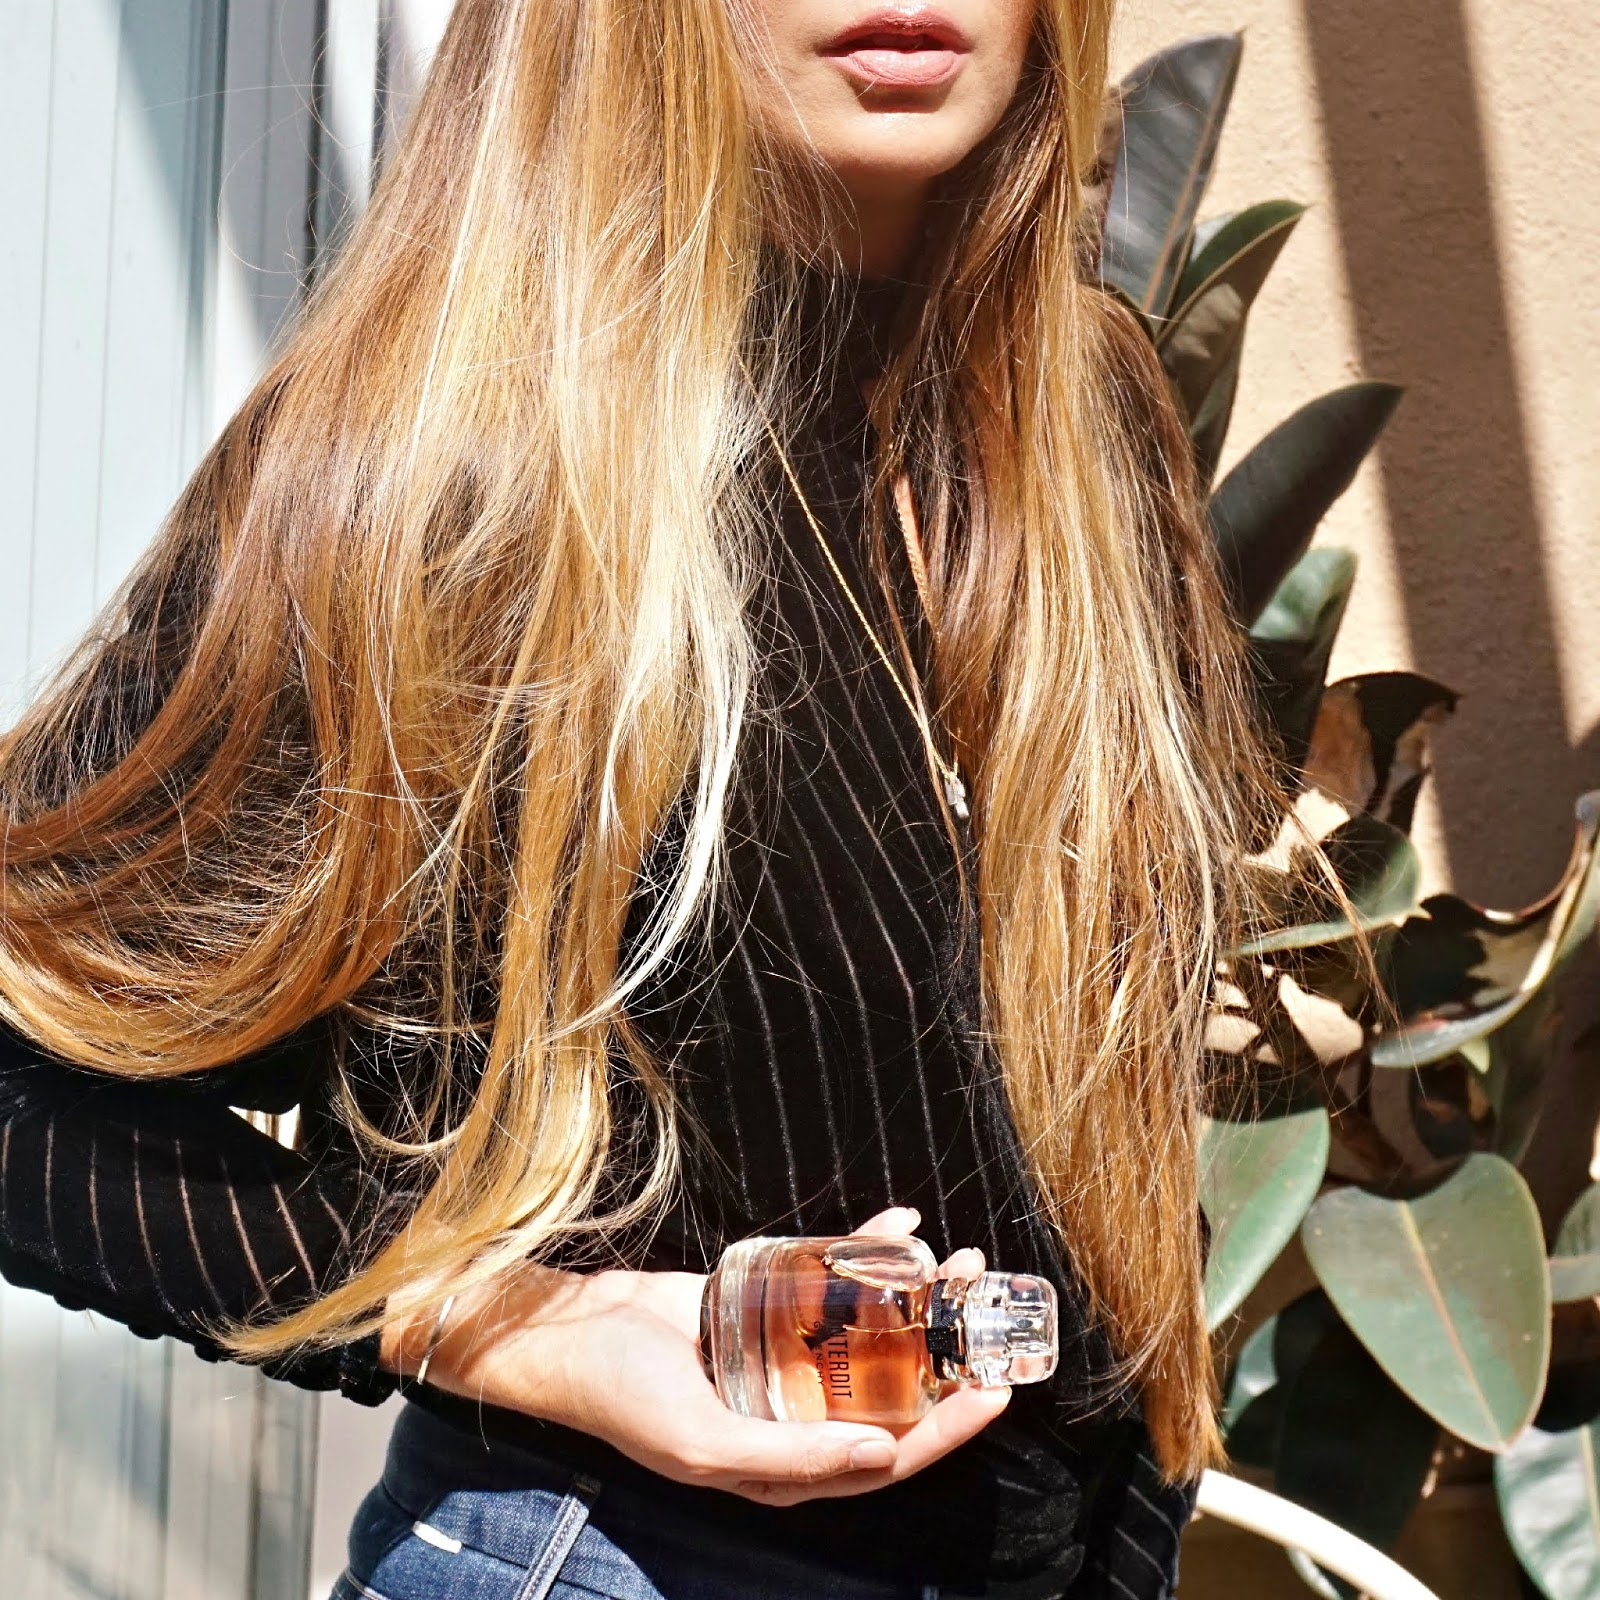 Givenchy L'Interdit EDP